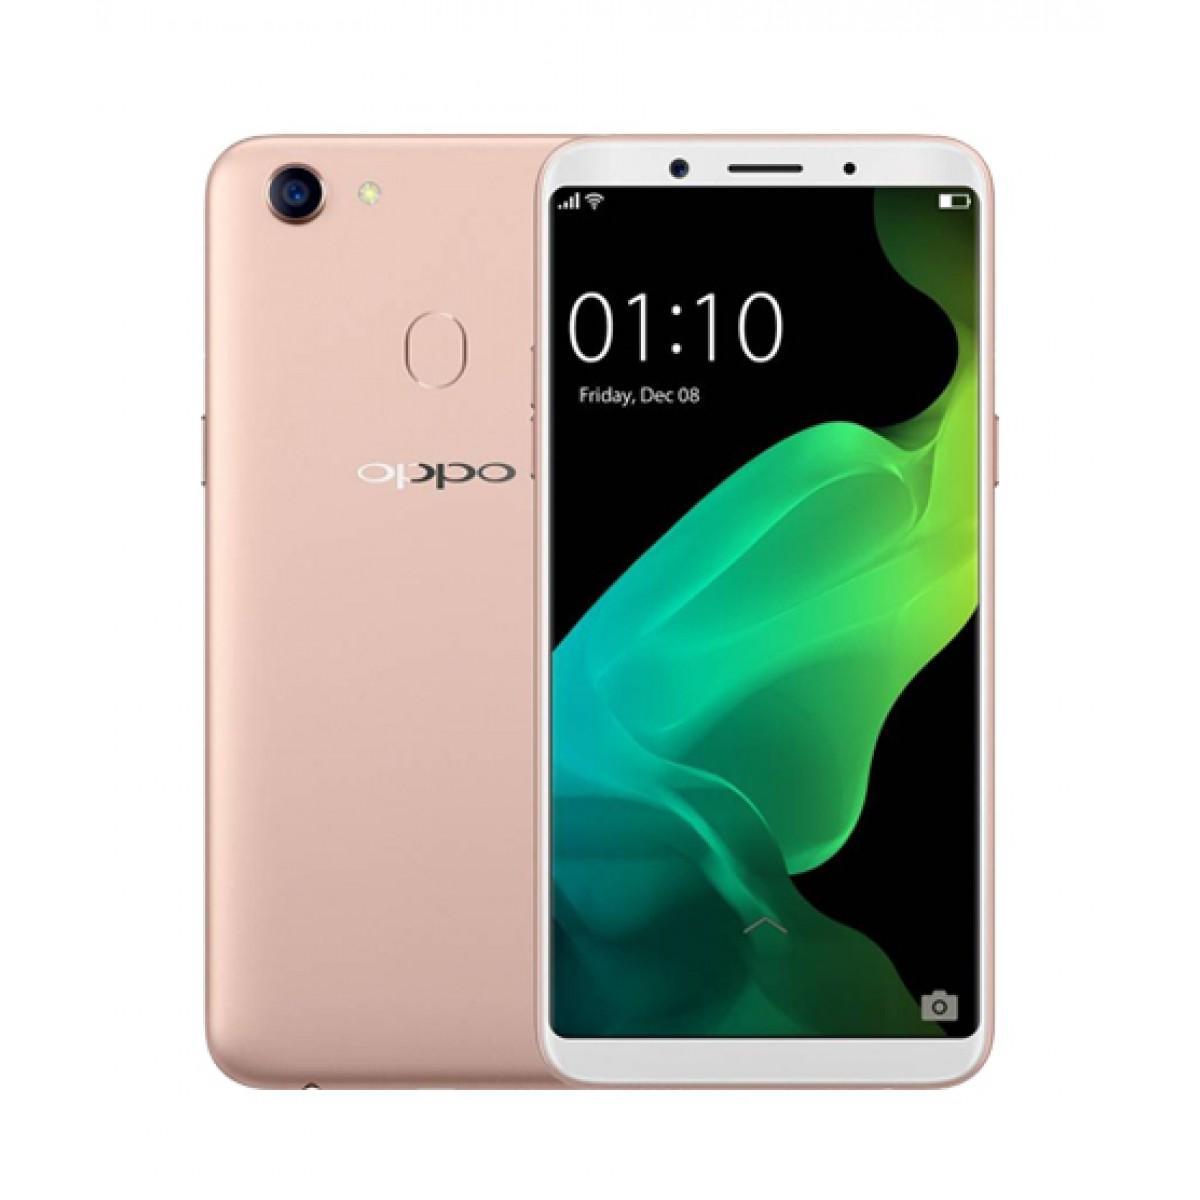 Kelebihan Oppo F7 Smartphone 25 Mp Ai Camera Ram 4 Gb 64gb Garansi Resmi Indonesia F5 20 Beauty Tech 6gb